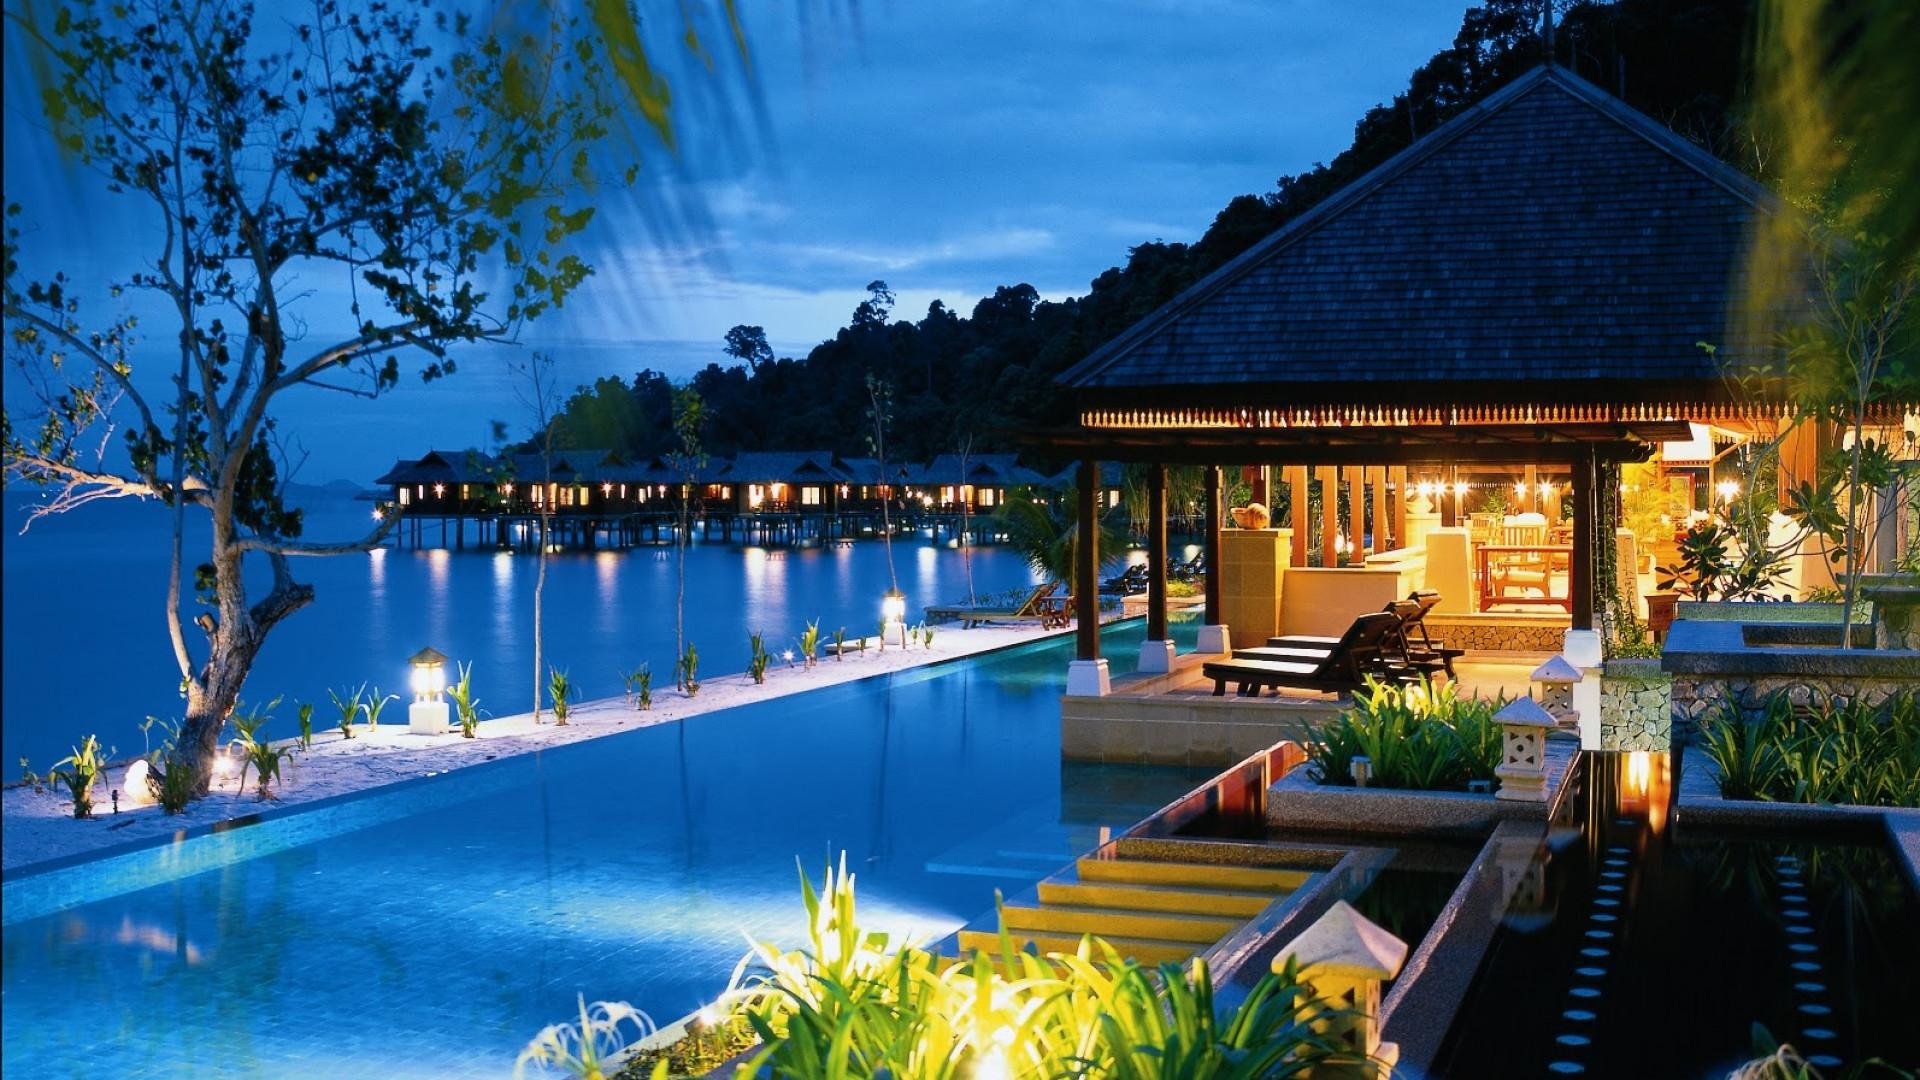 Villas at Pangkor Laut Resort, Malaysia